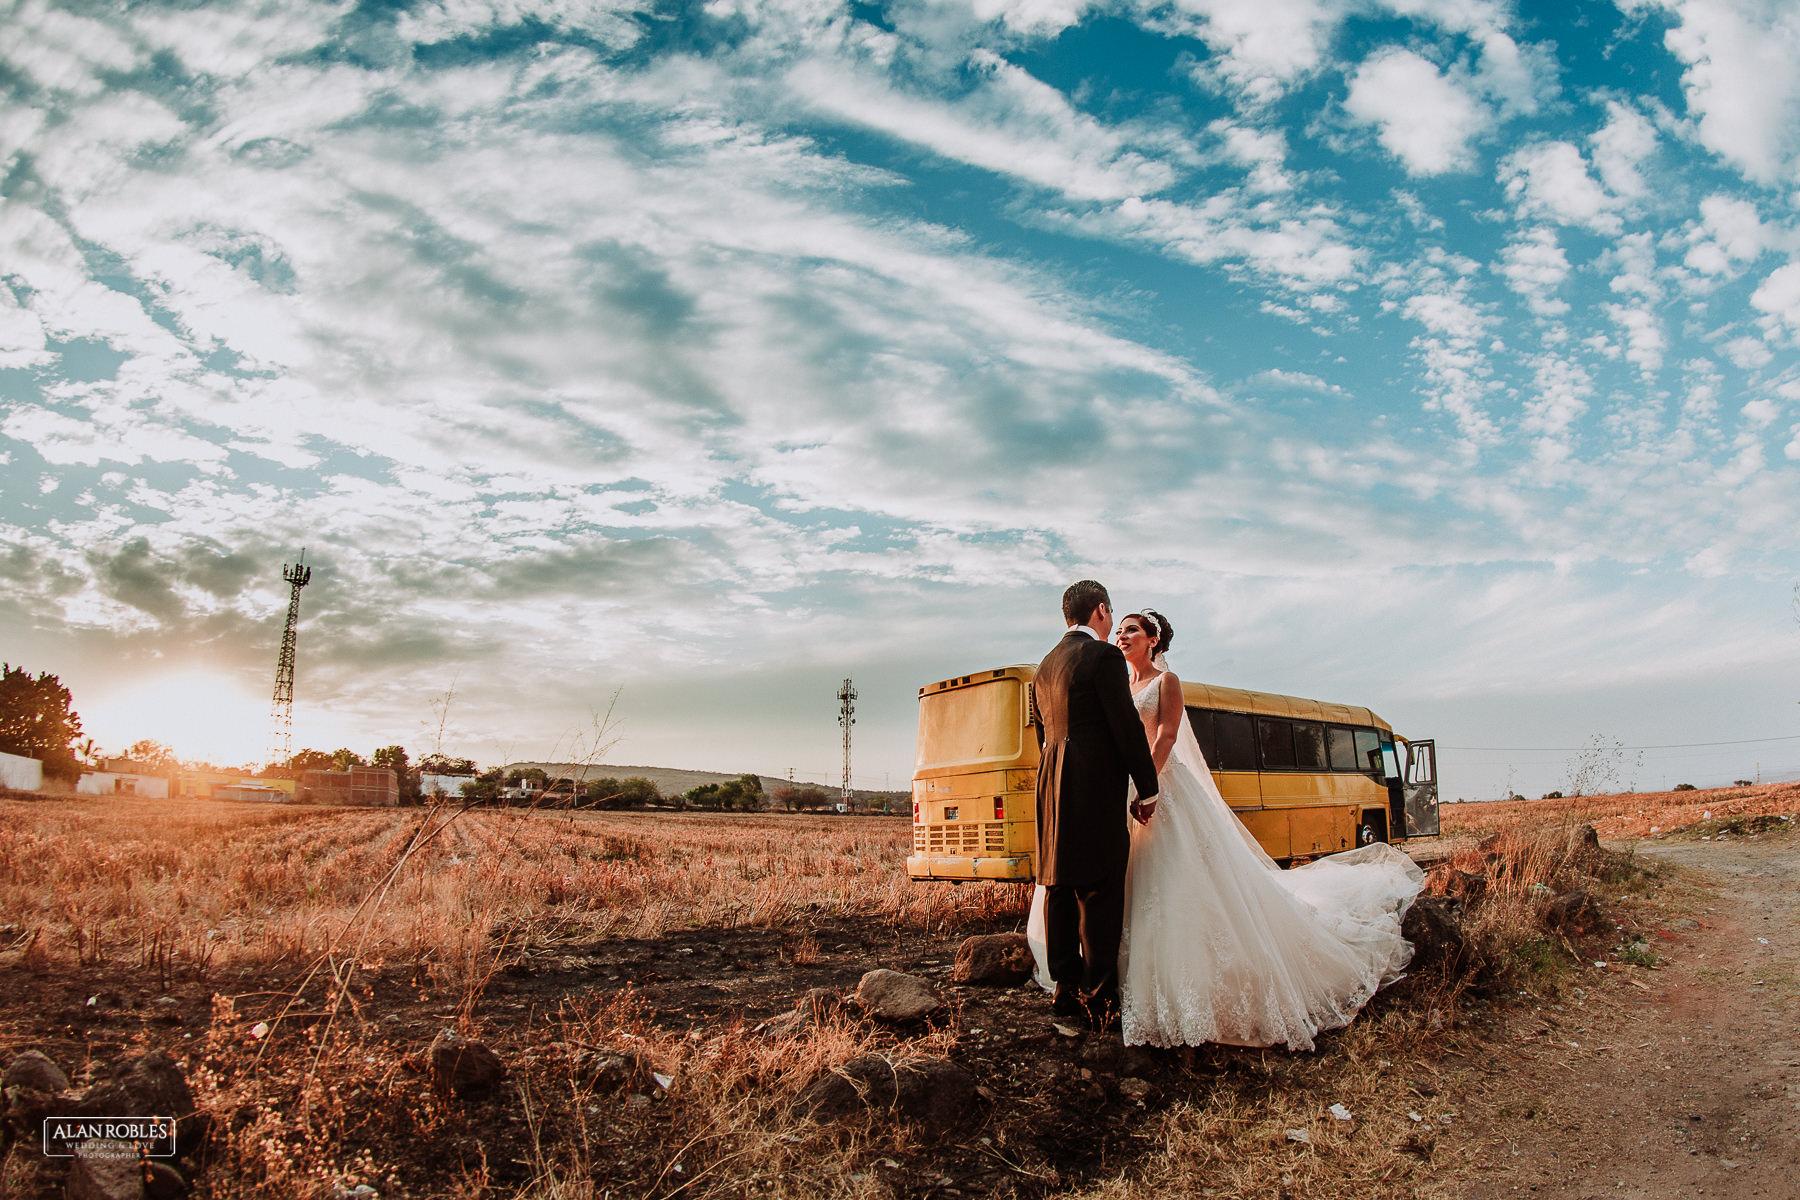 Alan Robles fotografo de bodas guadalajara - LyP Hotel Demetria-57